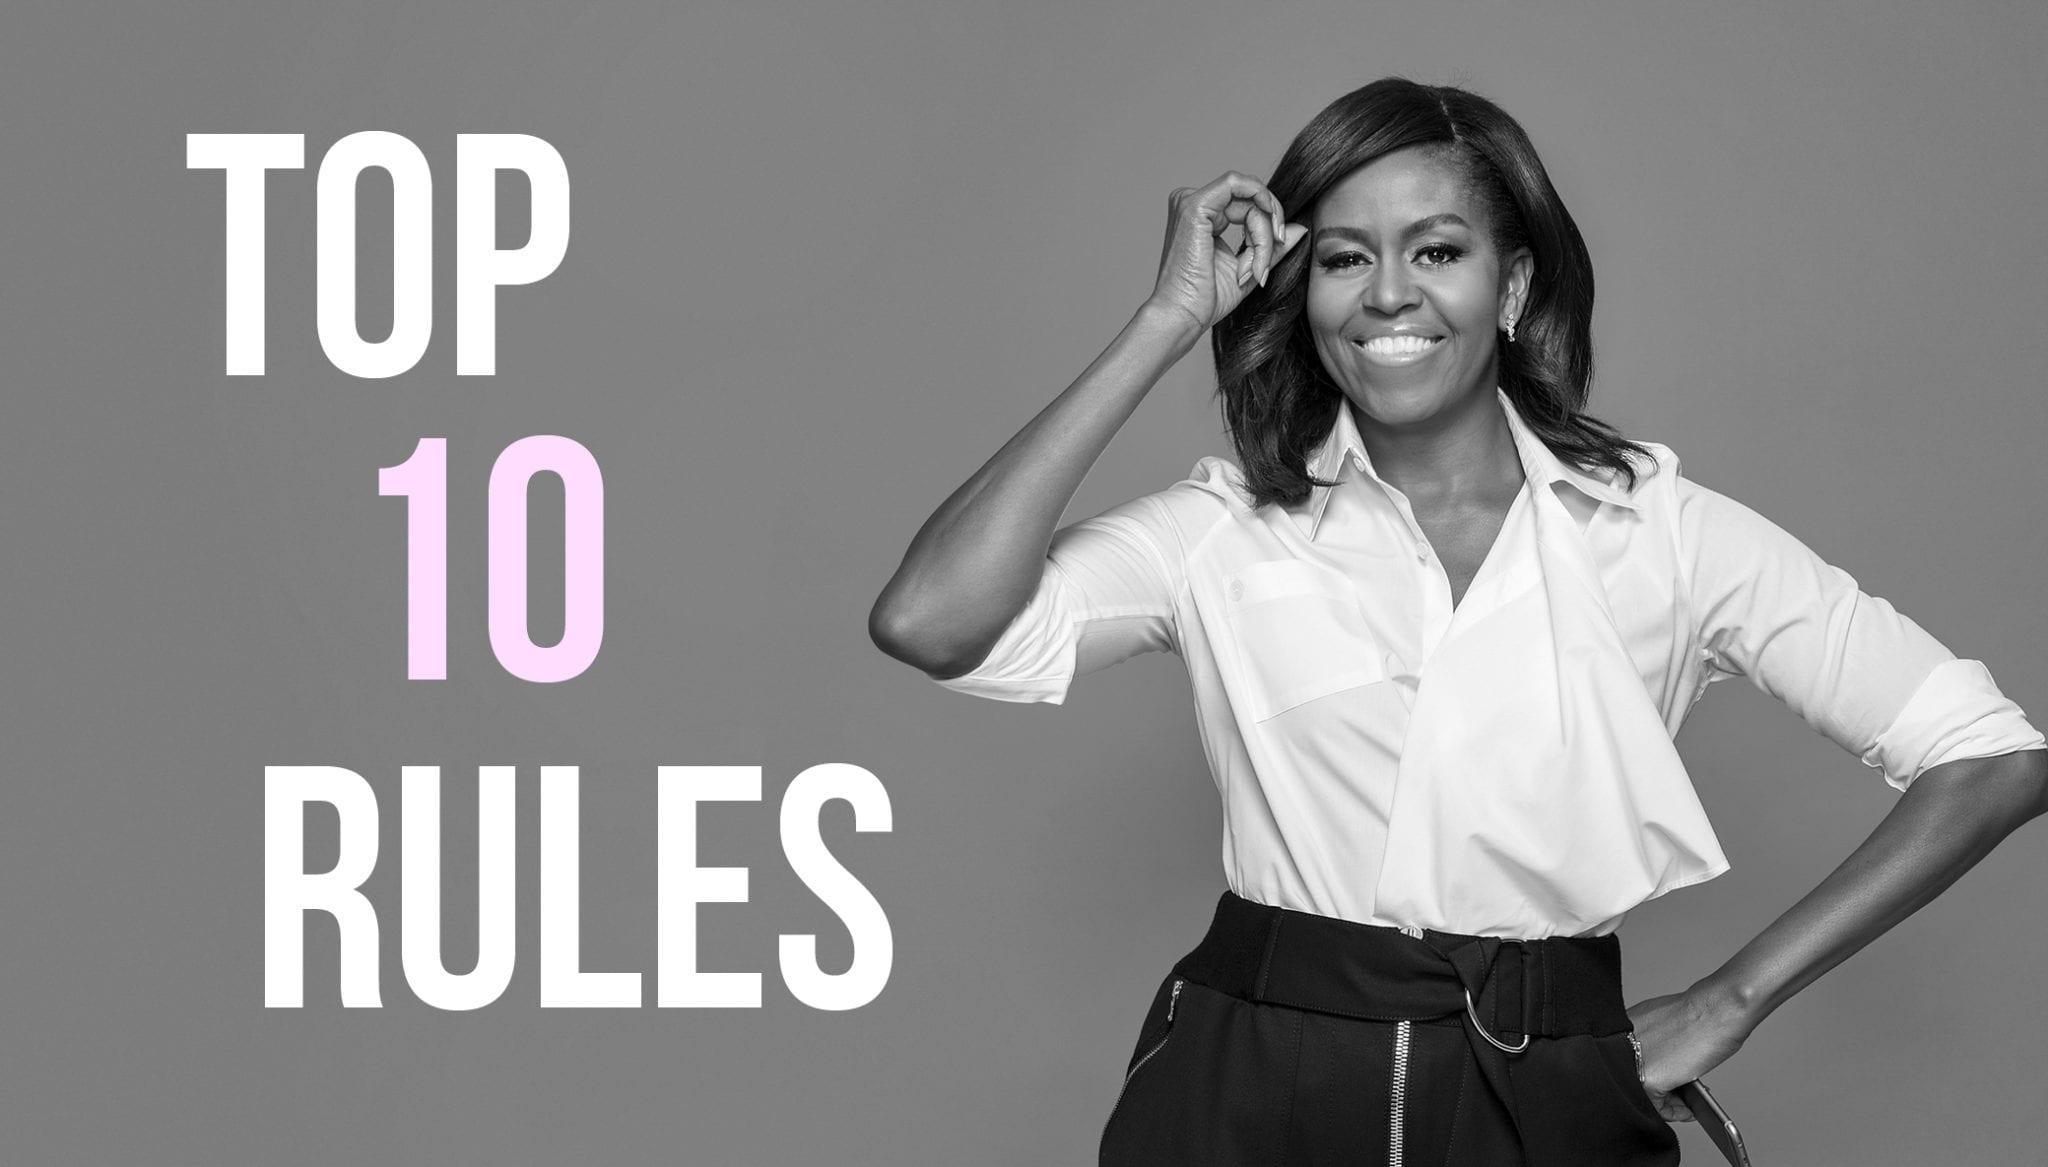 Les 10 Règles du Succès Selon Michelle Obama